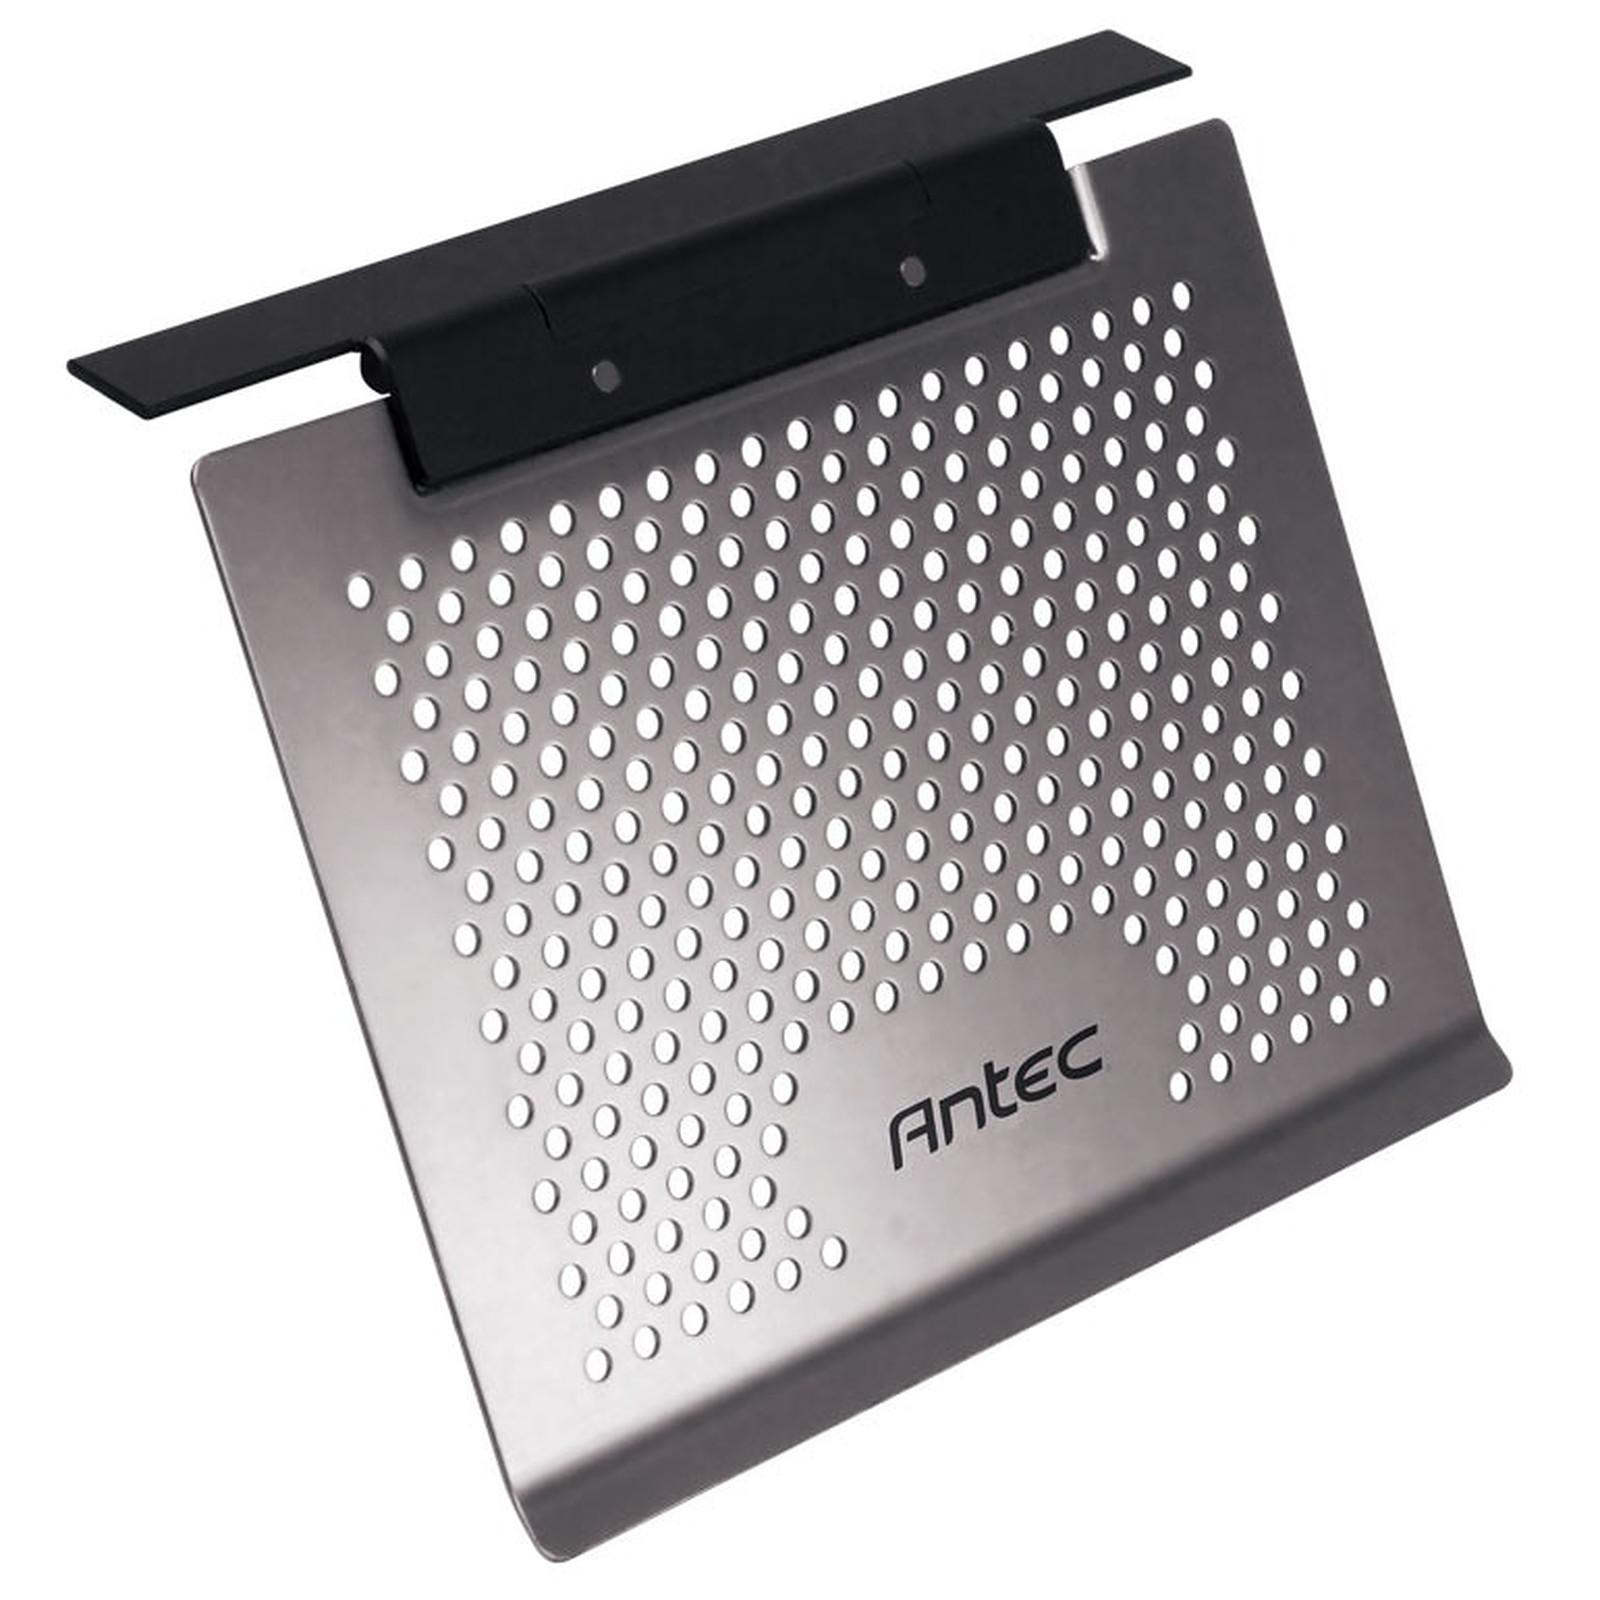 Antec Notebook Cooler Basic